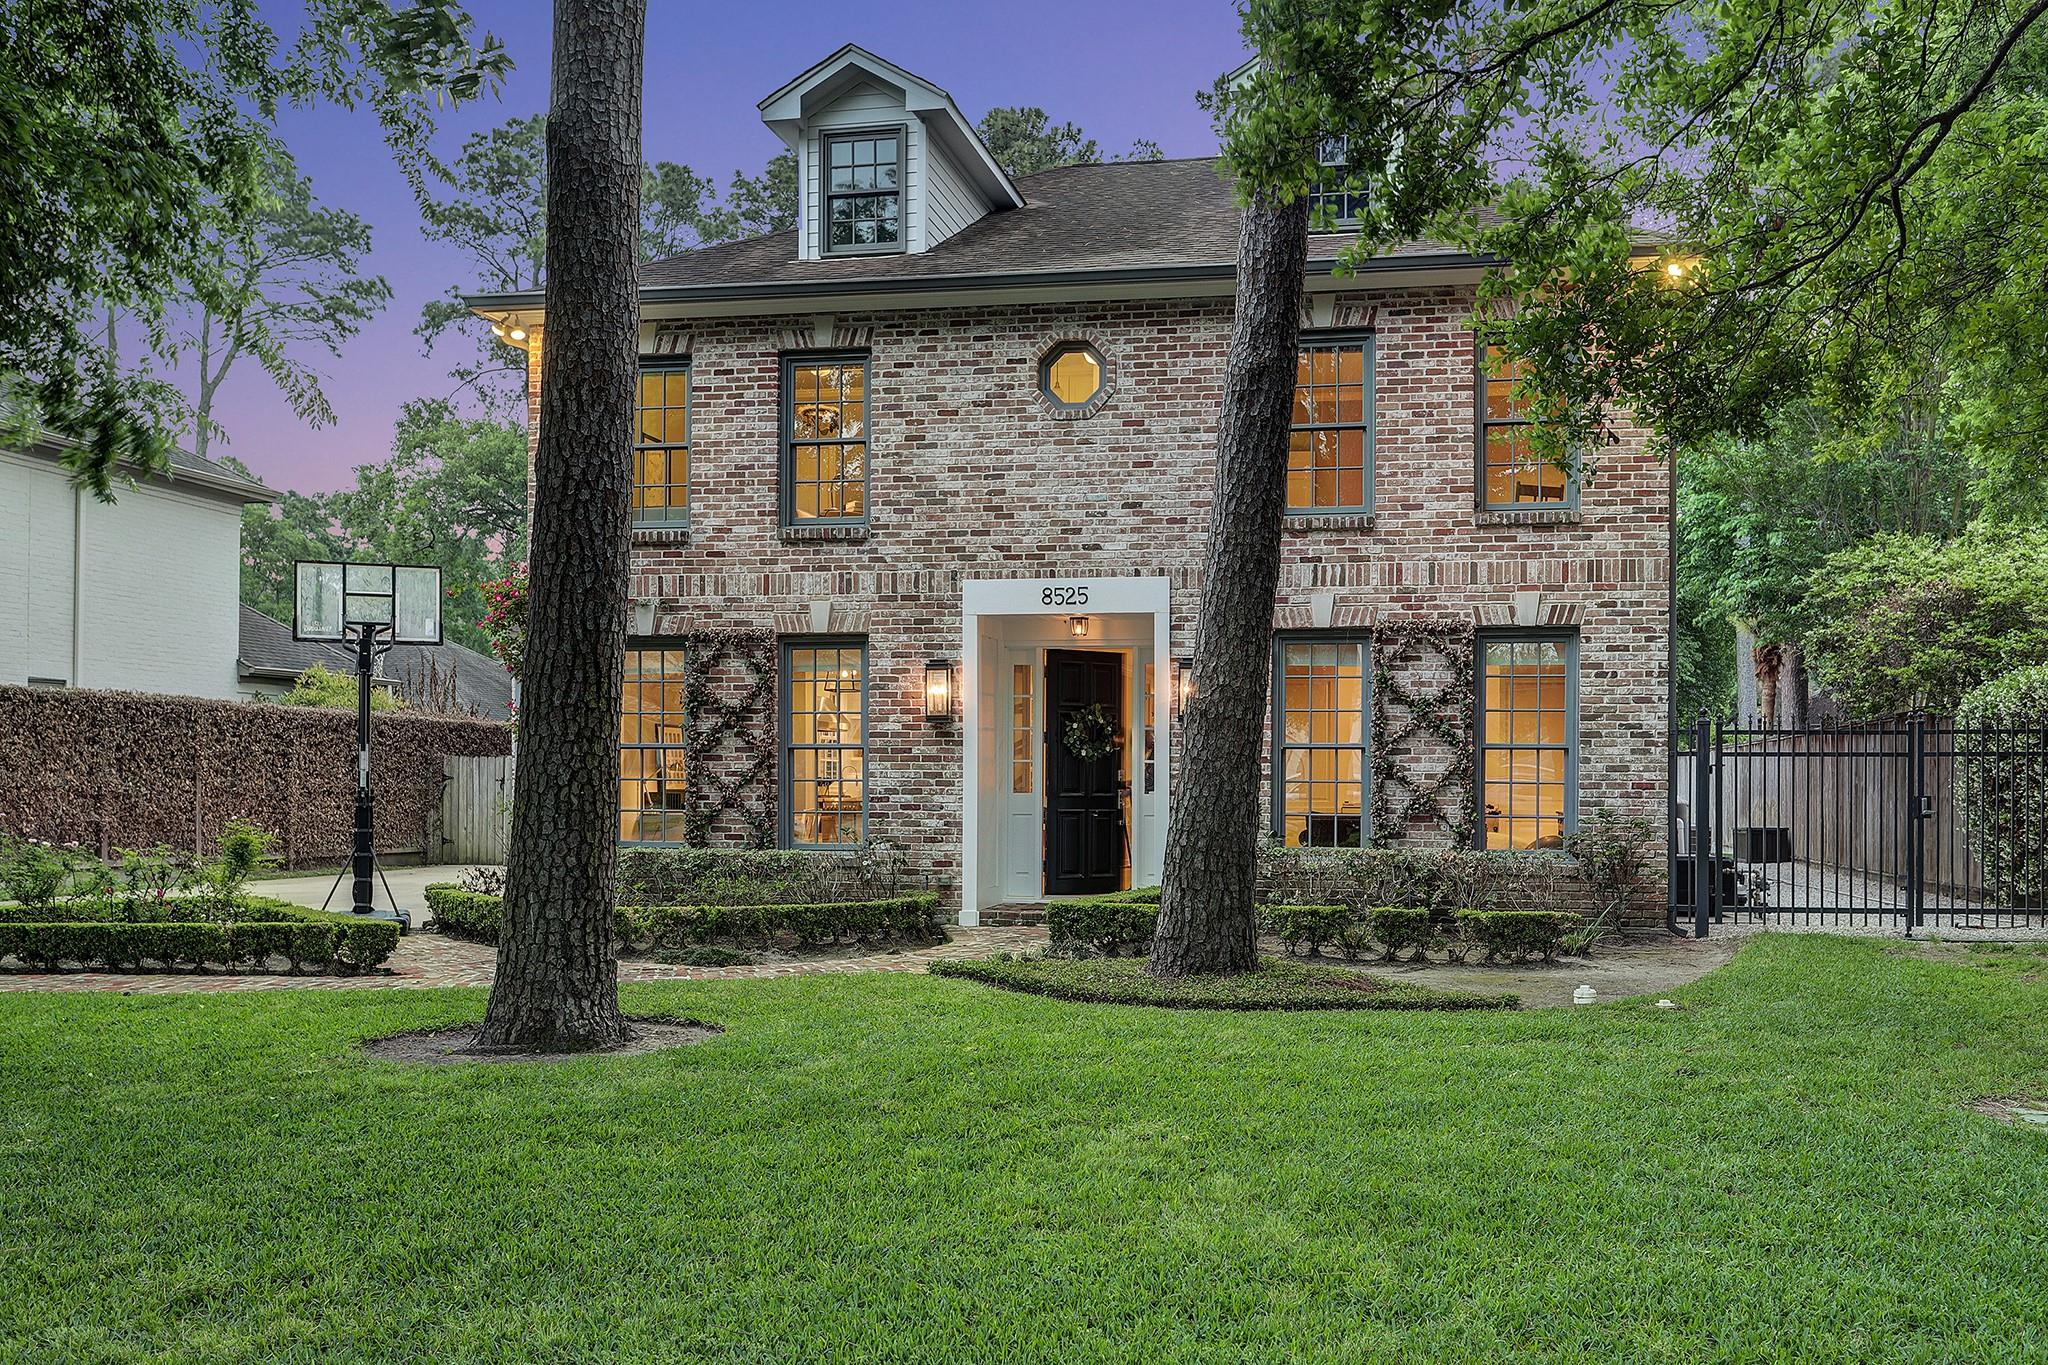 8525 Burkhart Road Property Photo - Houston, TX real estate listing